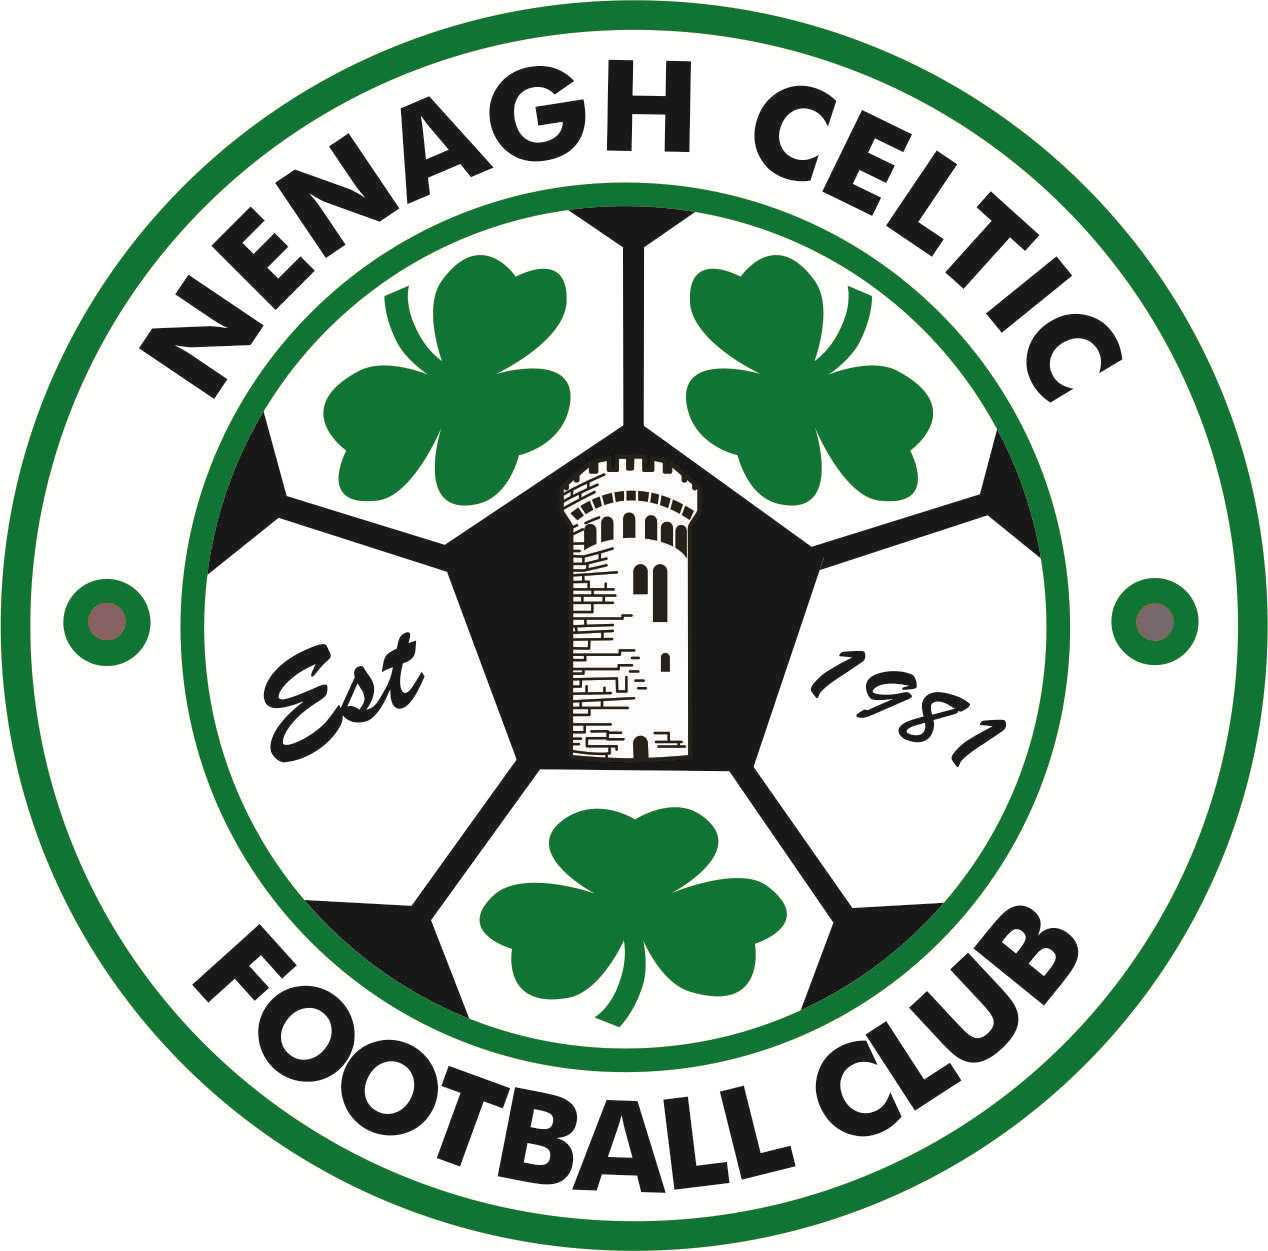 Nenagh Celtic FC